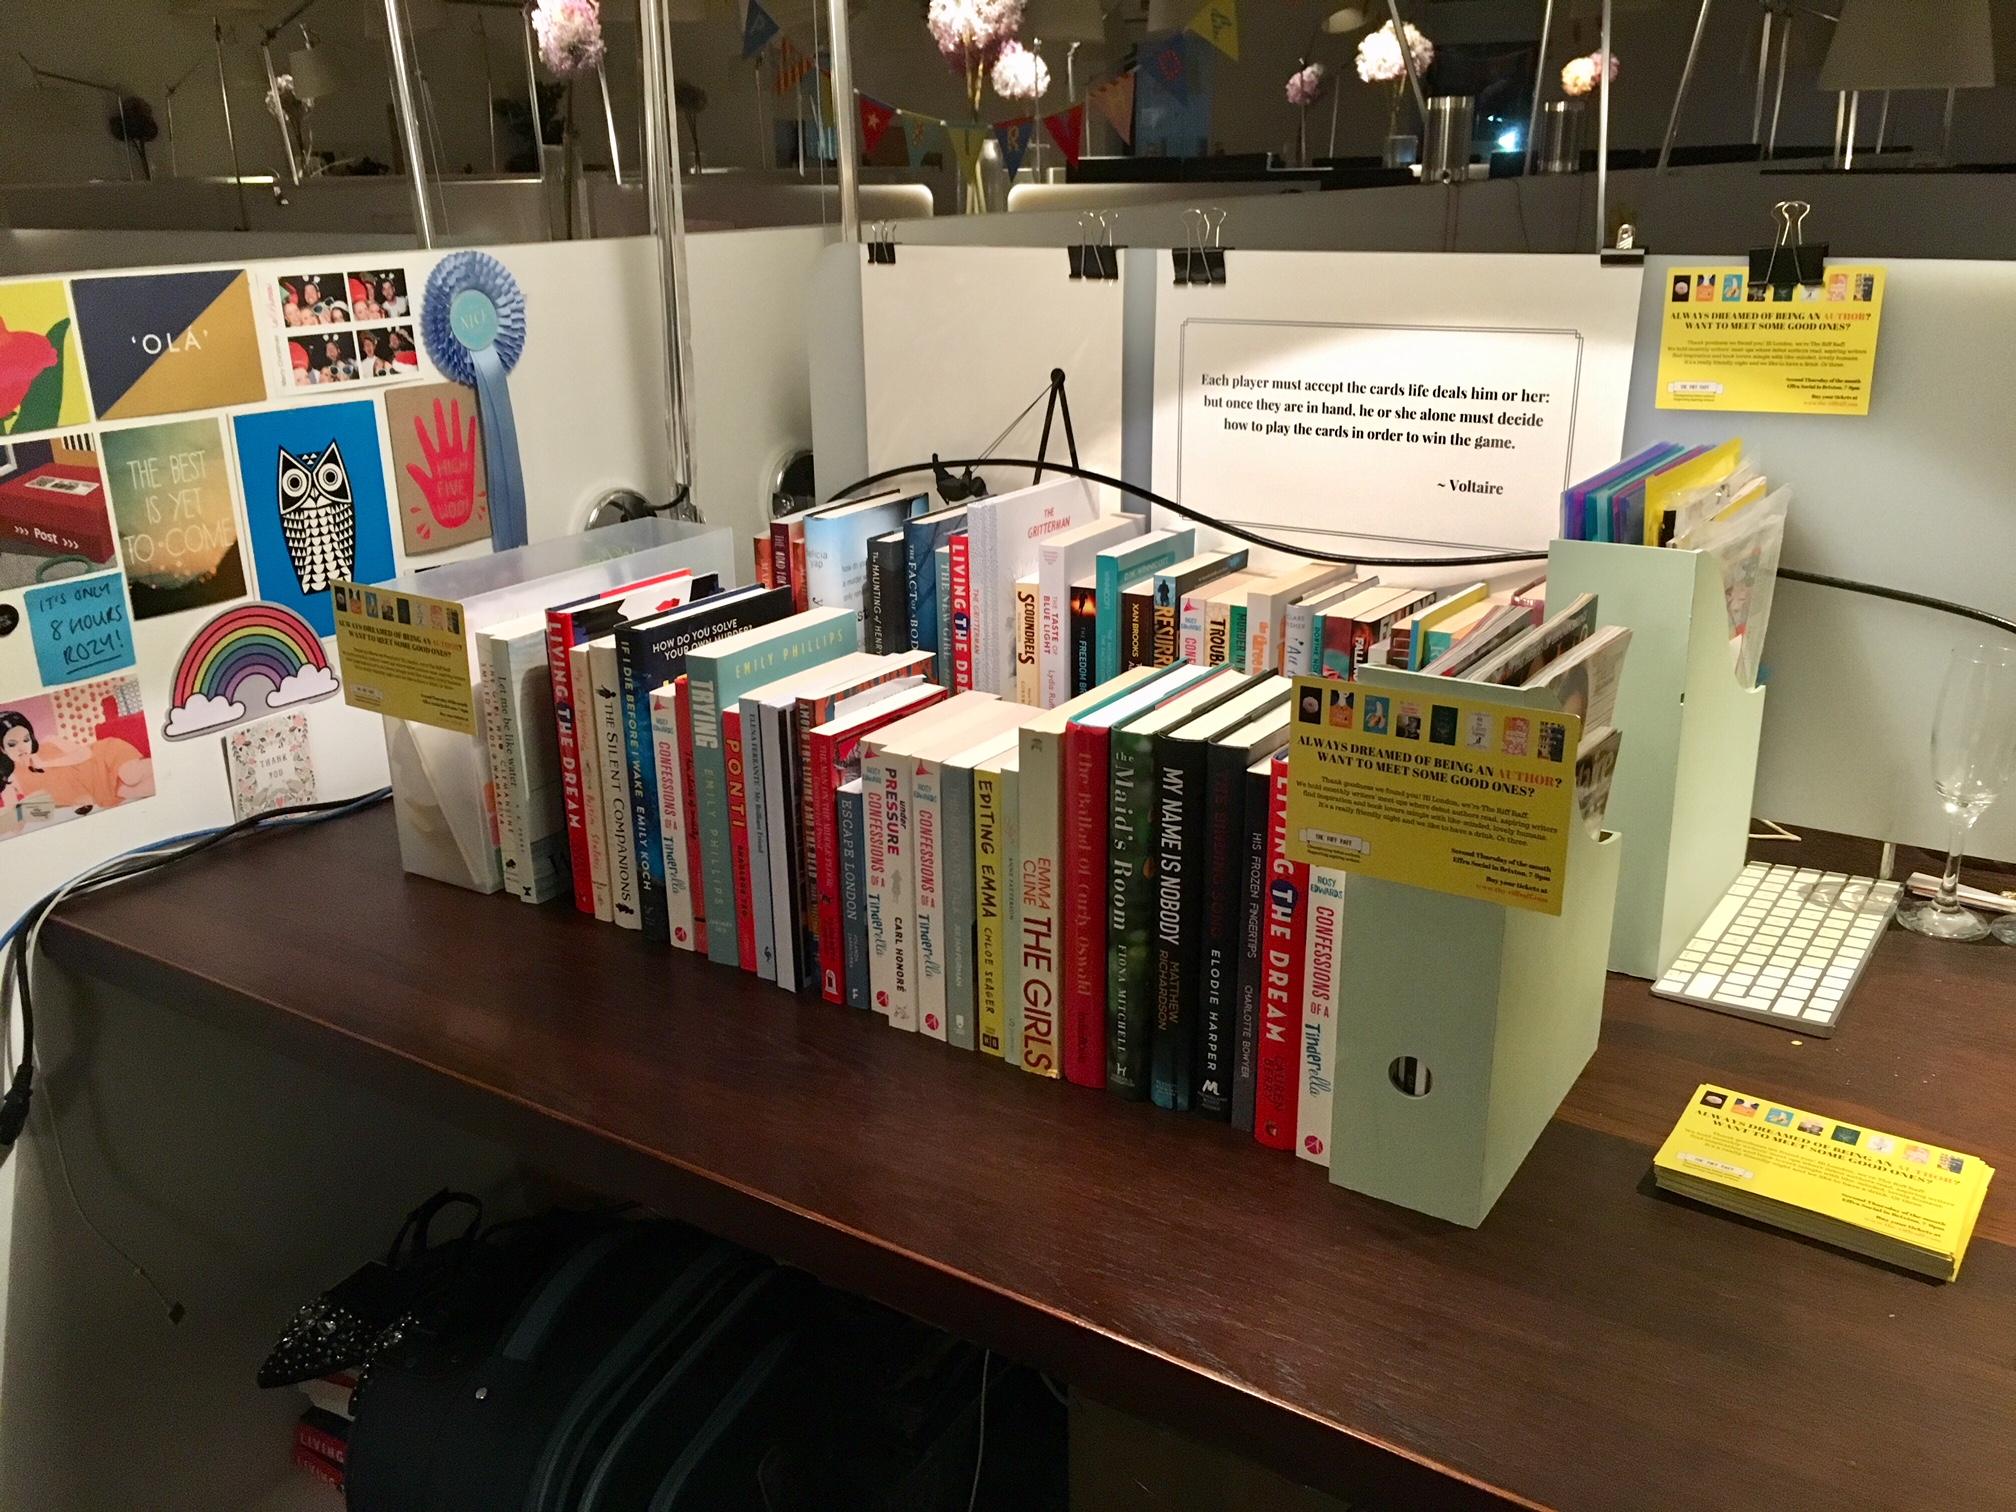 The Le Bureau shared office library